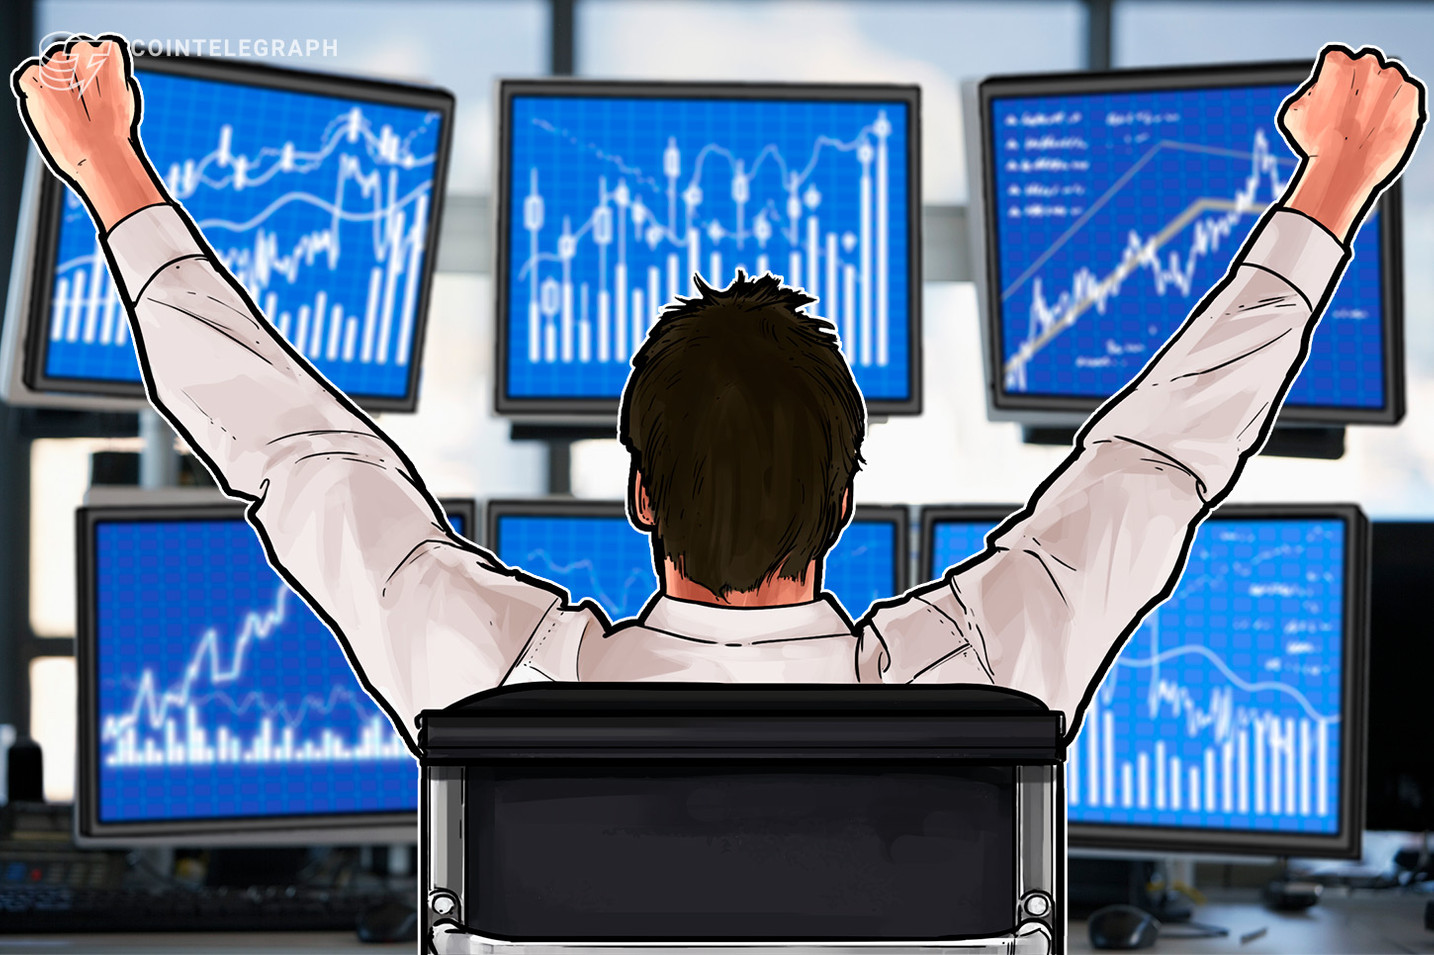 Bitcoin Price Diary: How REN/BTC Double Bottom Made Me 49% Profit